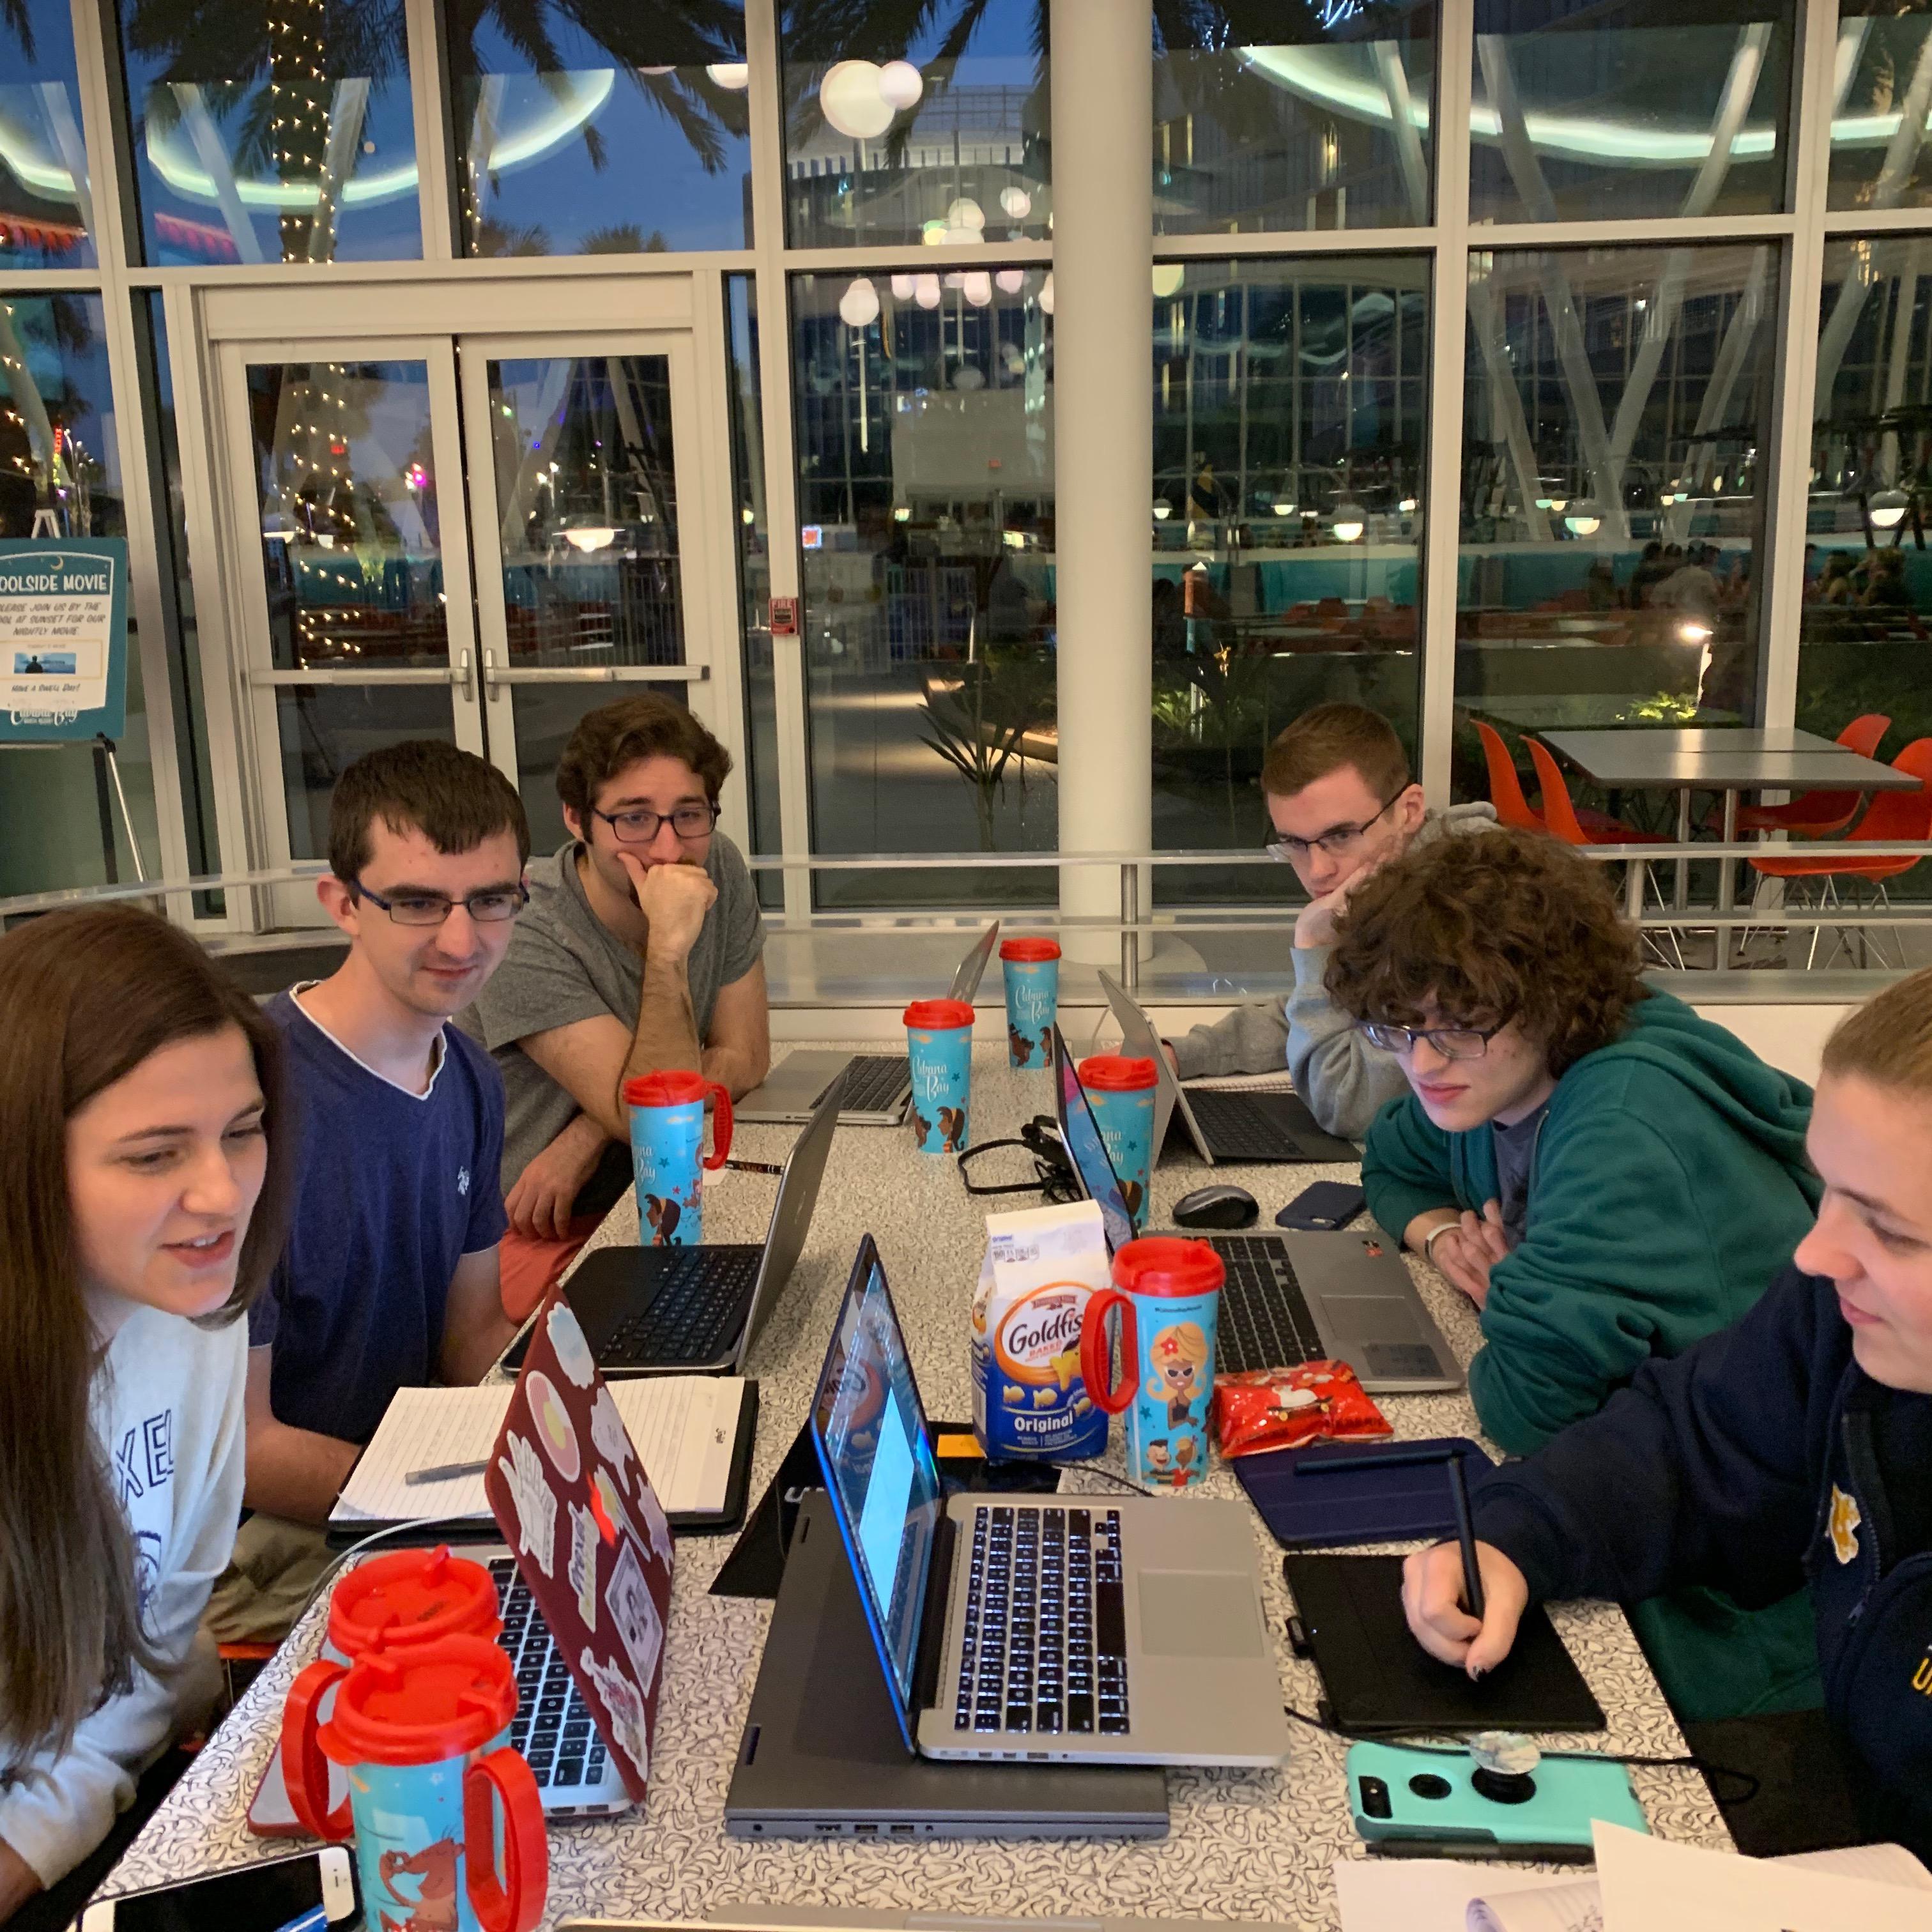 RITDC 2018 Team Working on Challenge